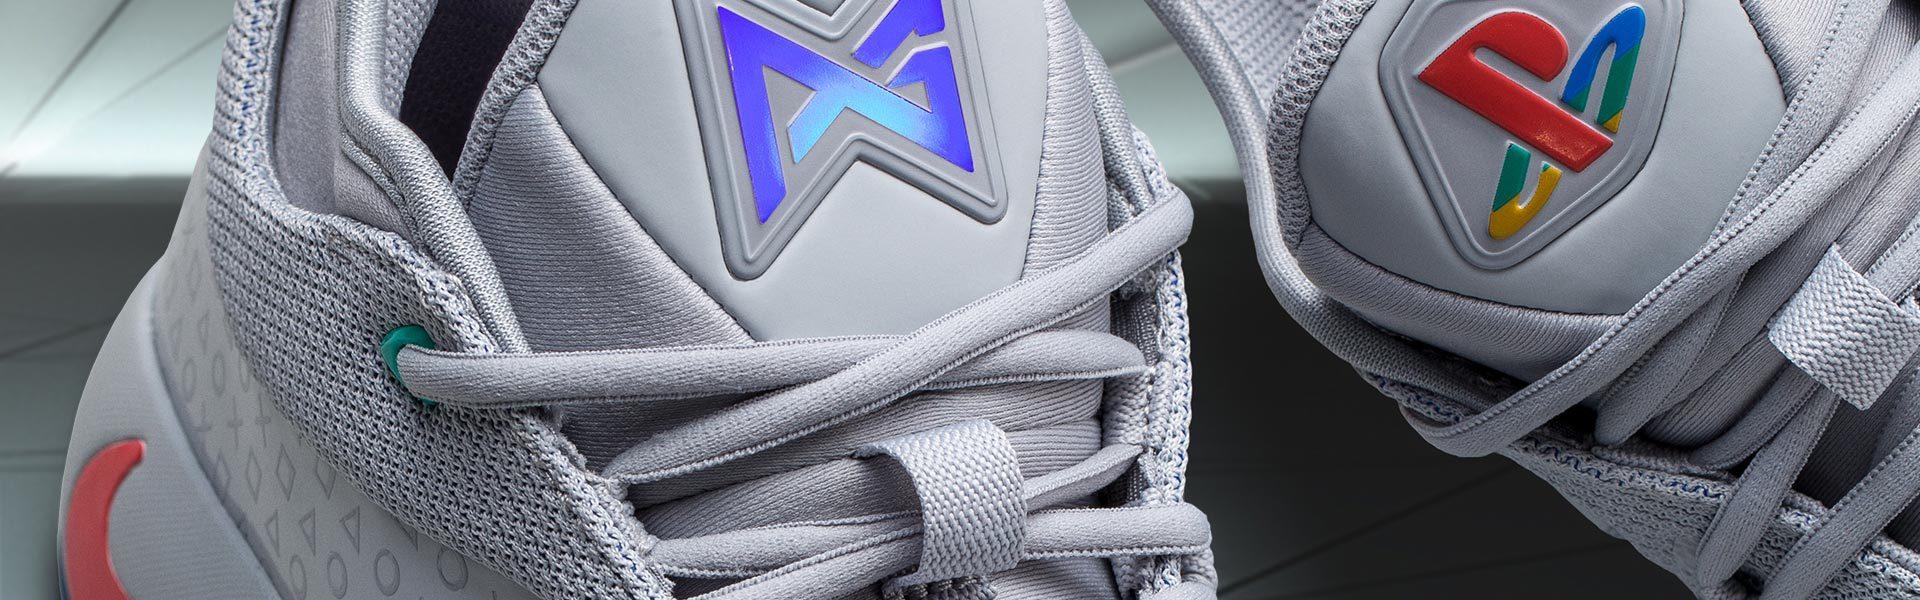 PG 2.5 x PlayStation Colorway sneakers